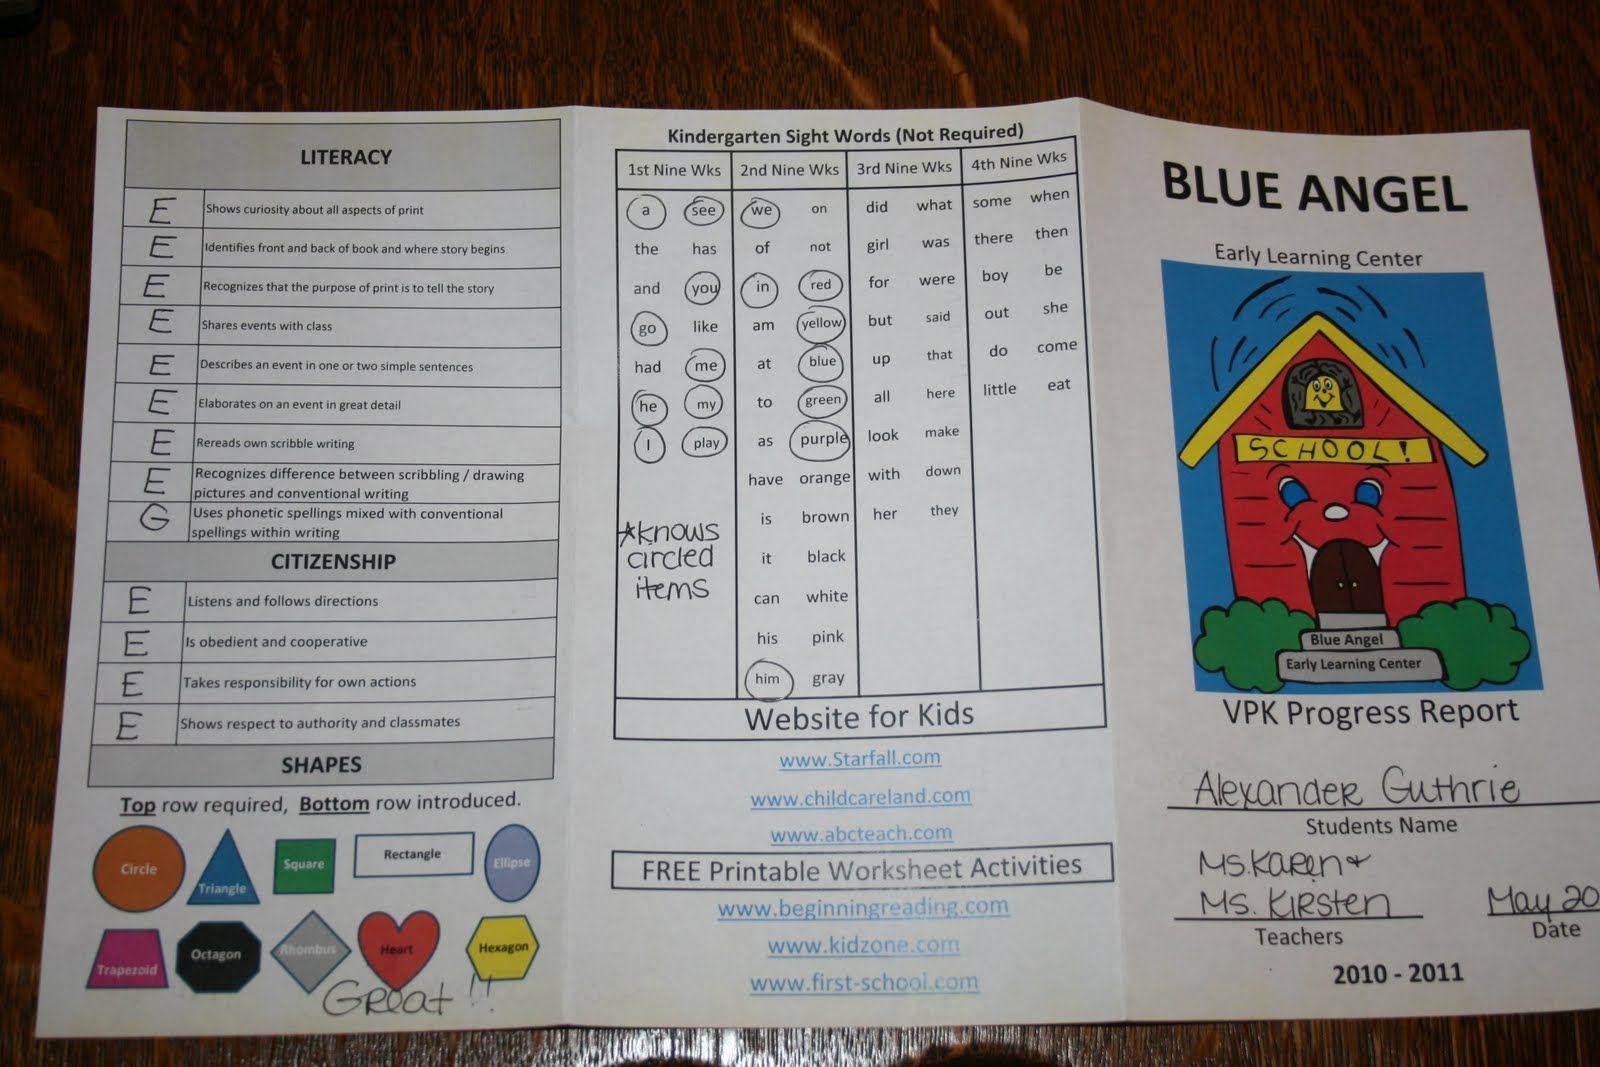 sample preschool report card Google Search Preschool